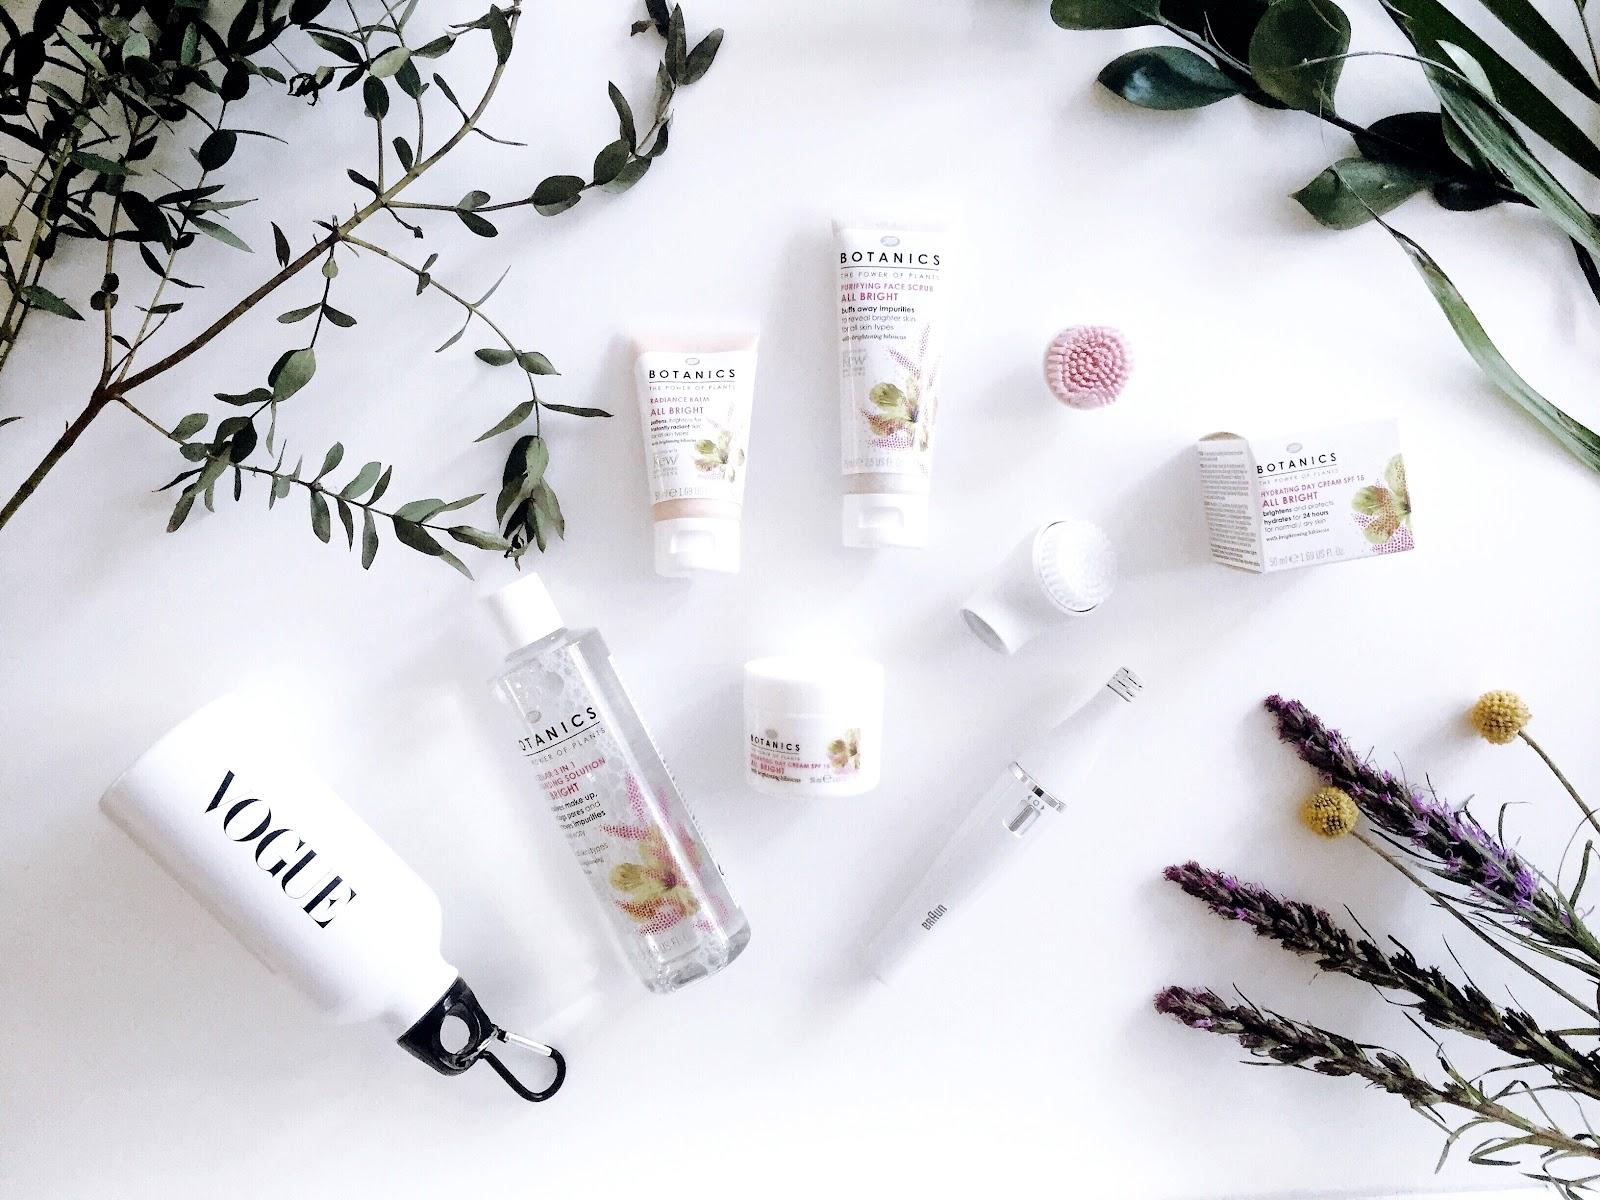 Boots Botanics - 4 beauty products for skin that glows Face scrub micellar daycream radiance balm